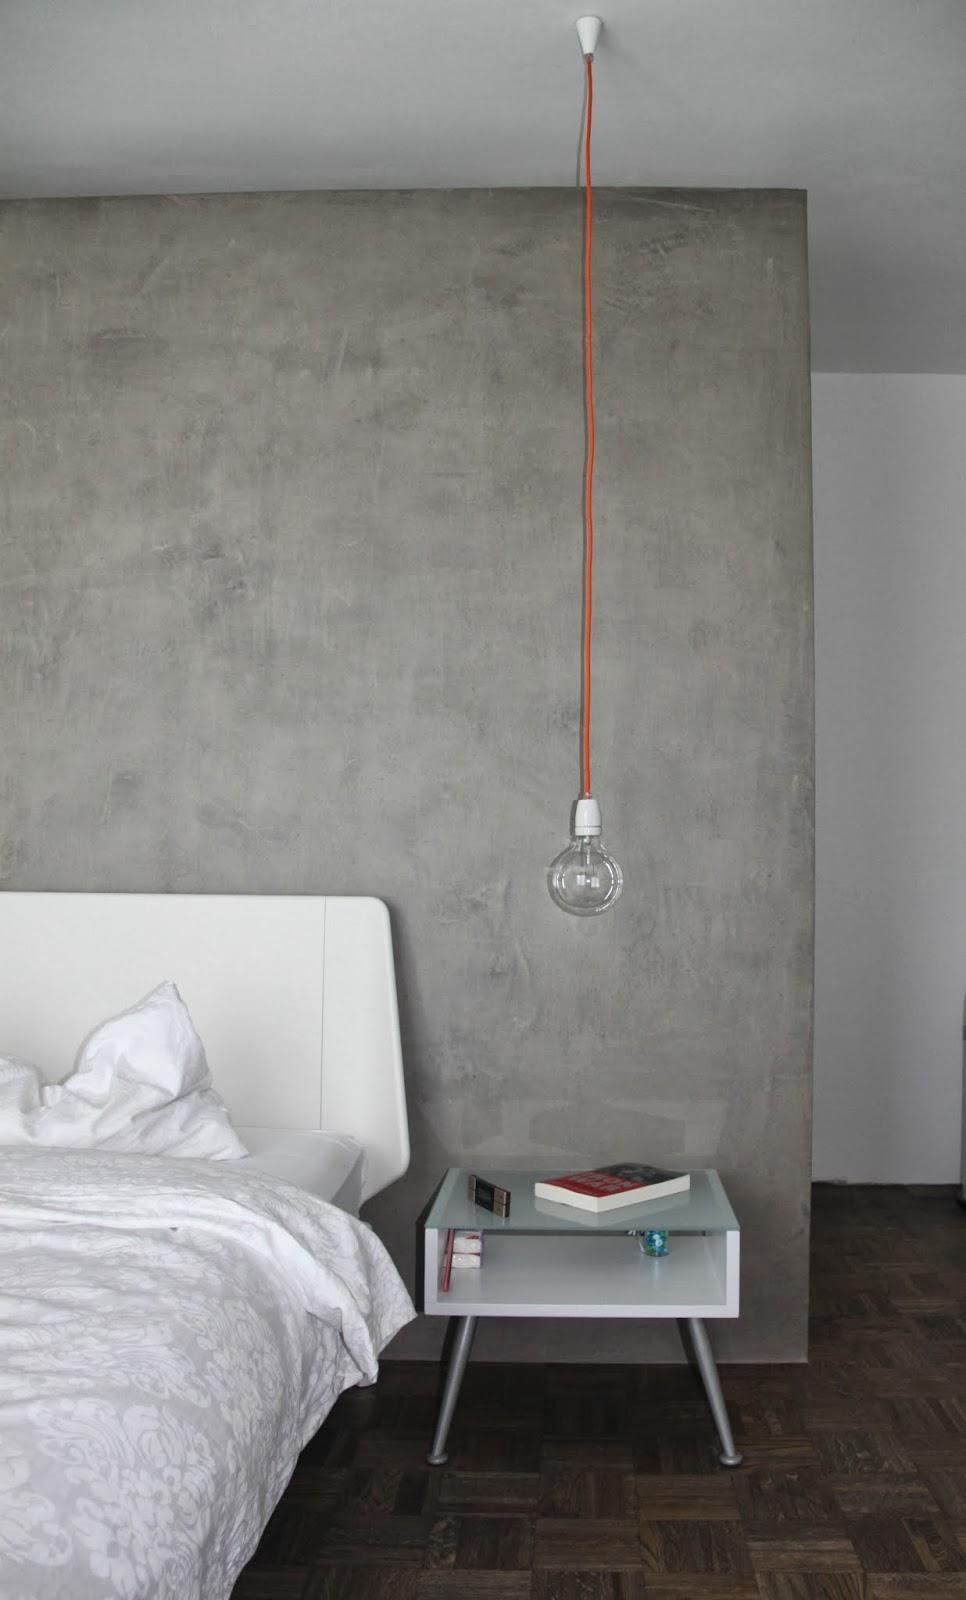 beton cire oberfl chen in beton look beton wand sichtbeton wand beton cire. Black Bedroom Furniture Sets. Home Design Ideas